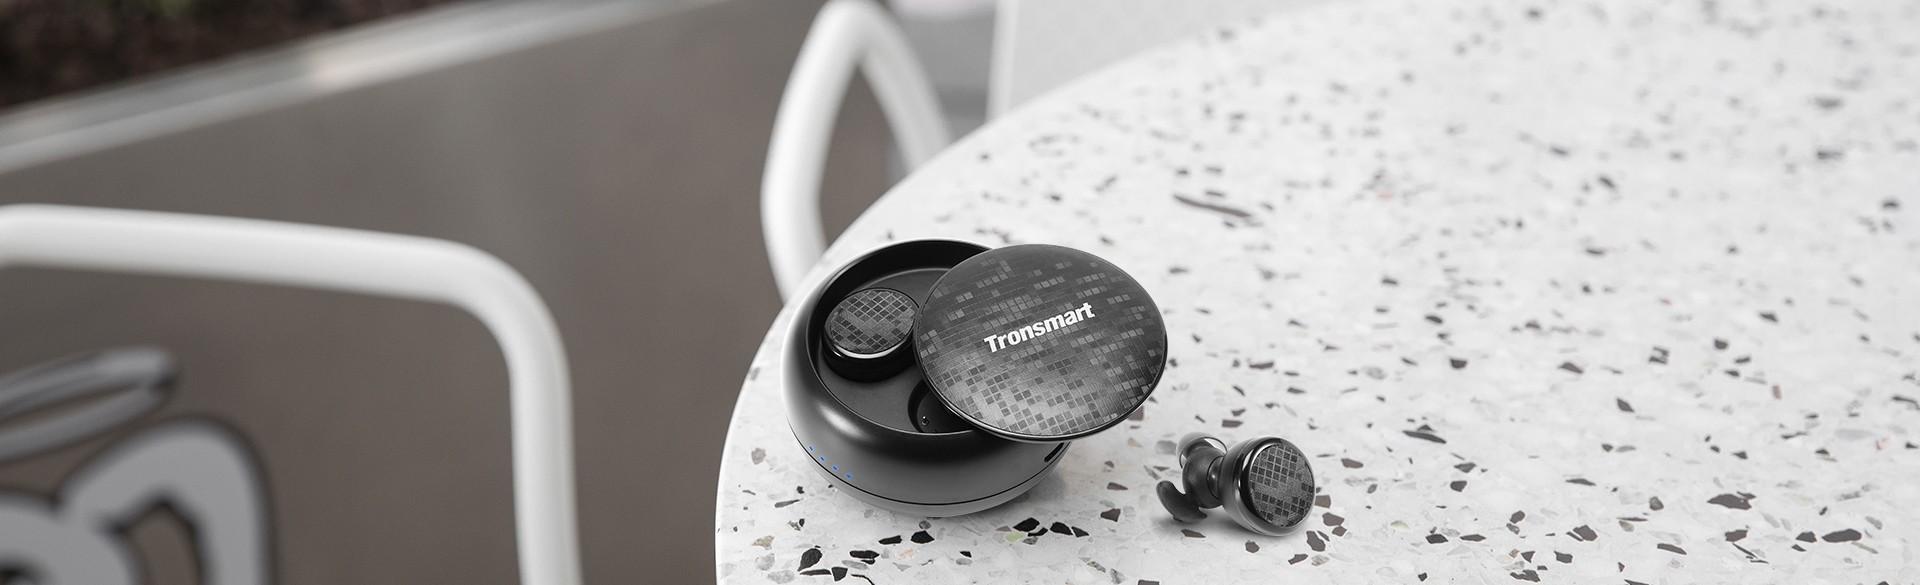 Brezžične Slušalke Tronsmart